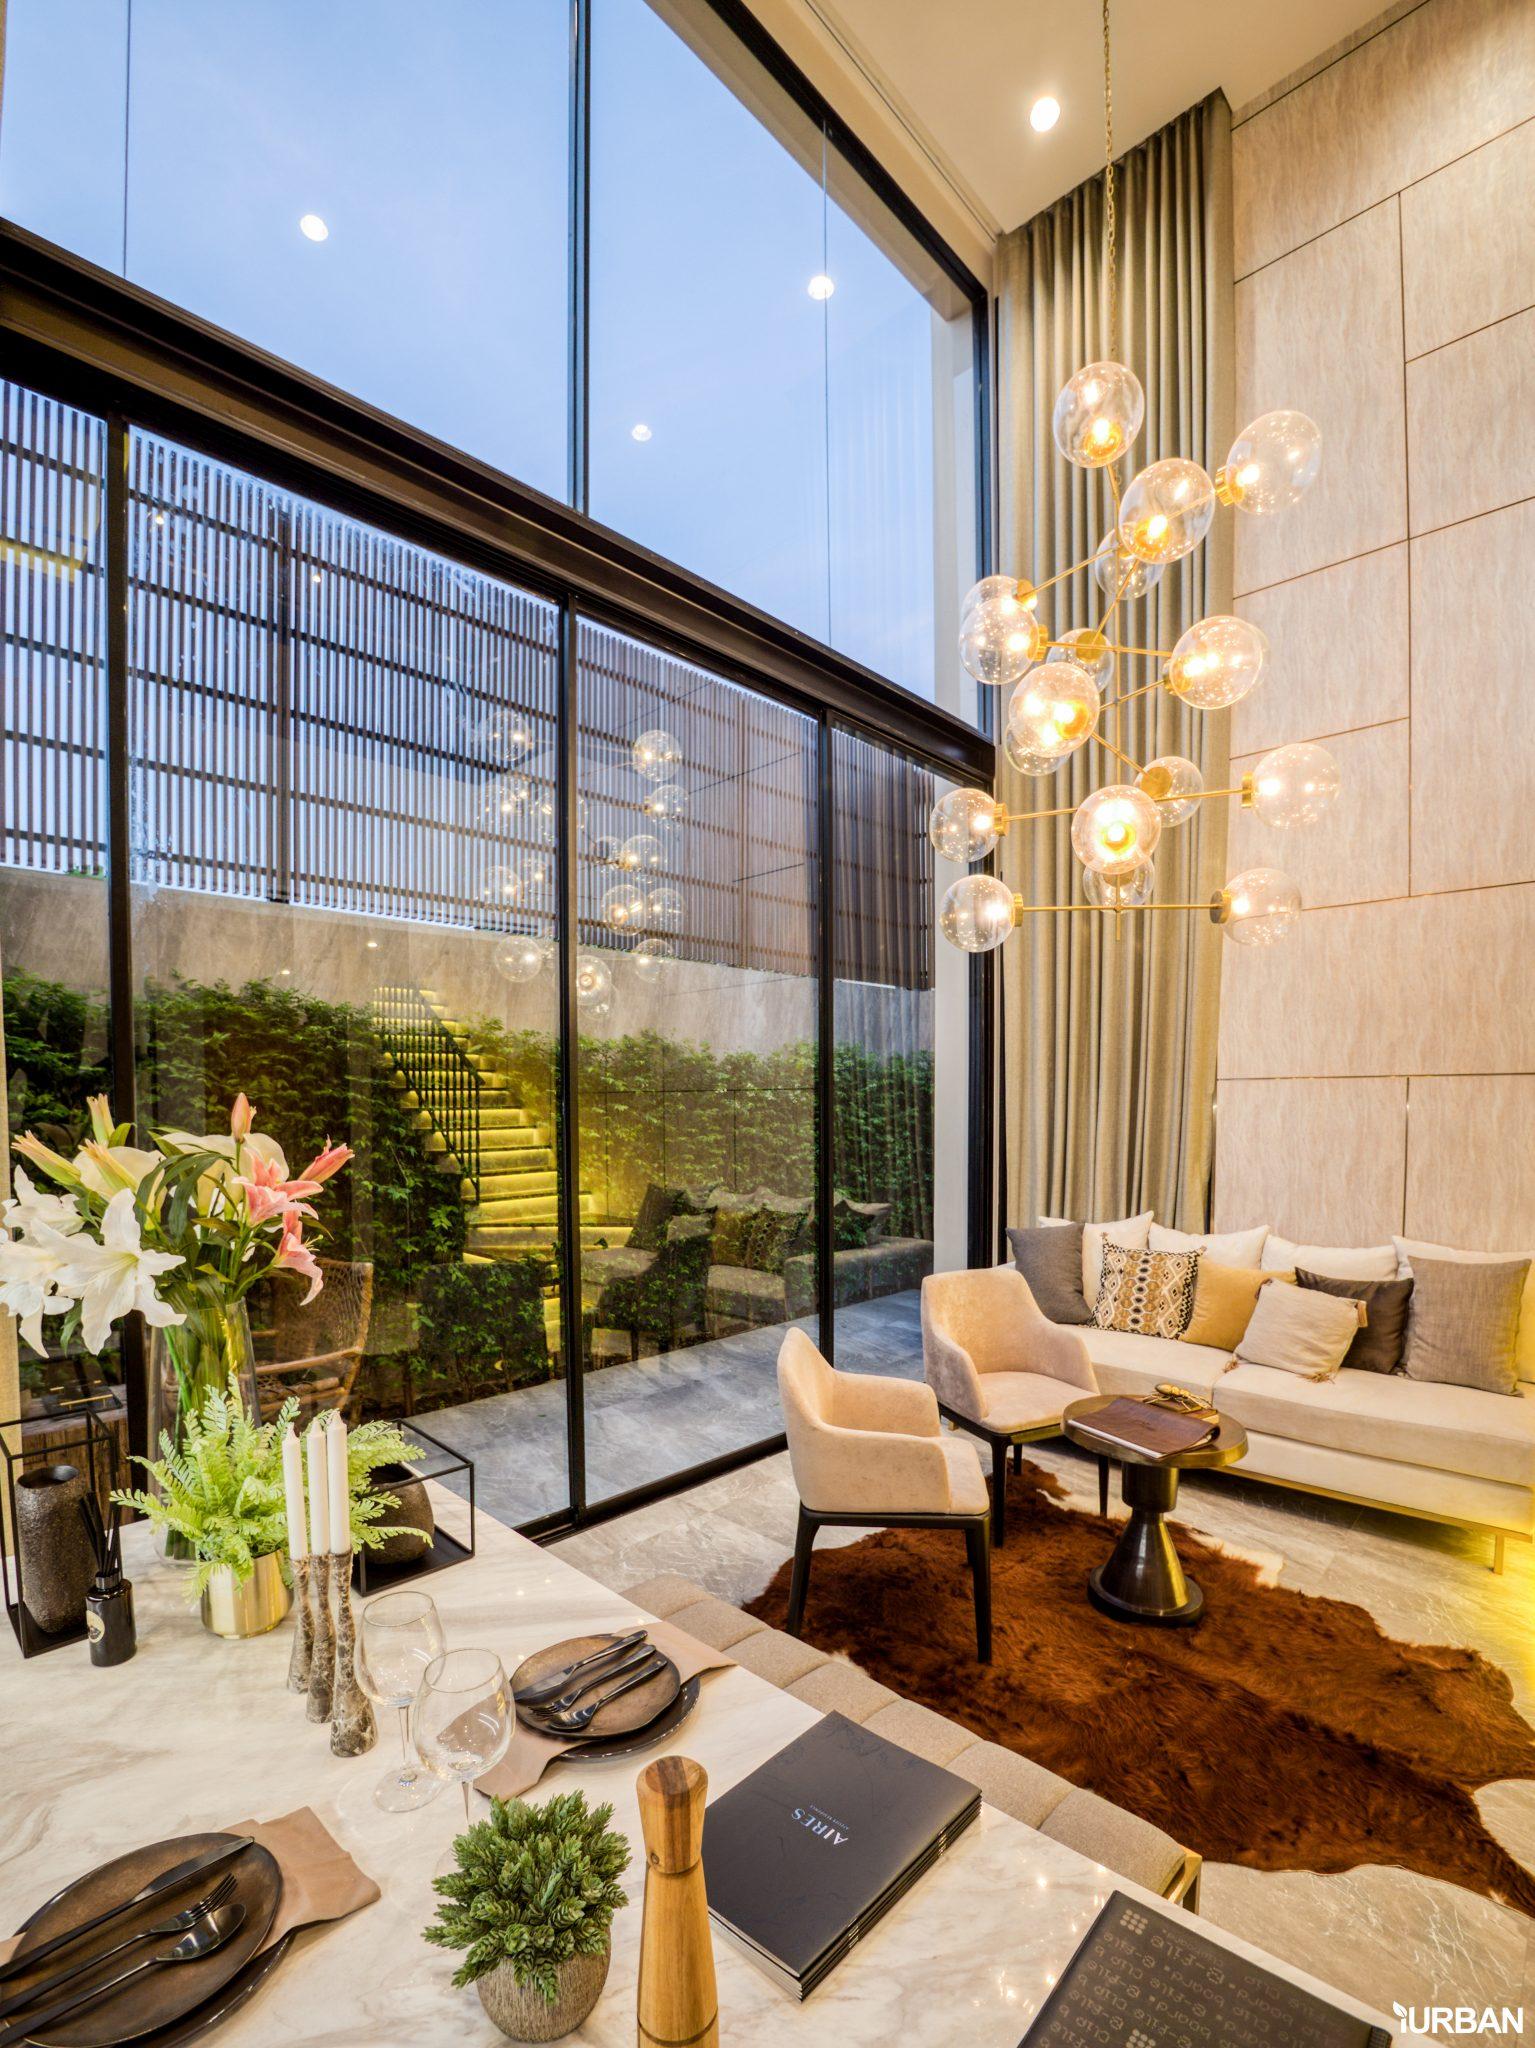 AIRES RAMA9 รีวิว Luxury Townhome 3.5 ชั้น + Rooftop ออกแบบสวย ย่านพระราม9 (ใกล้ รพ.สมิติเวช) 30 - AIRES